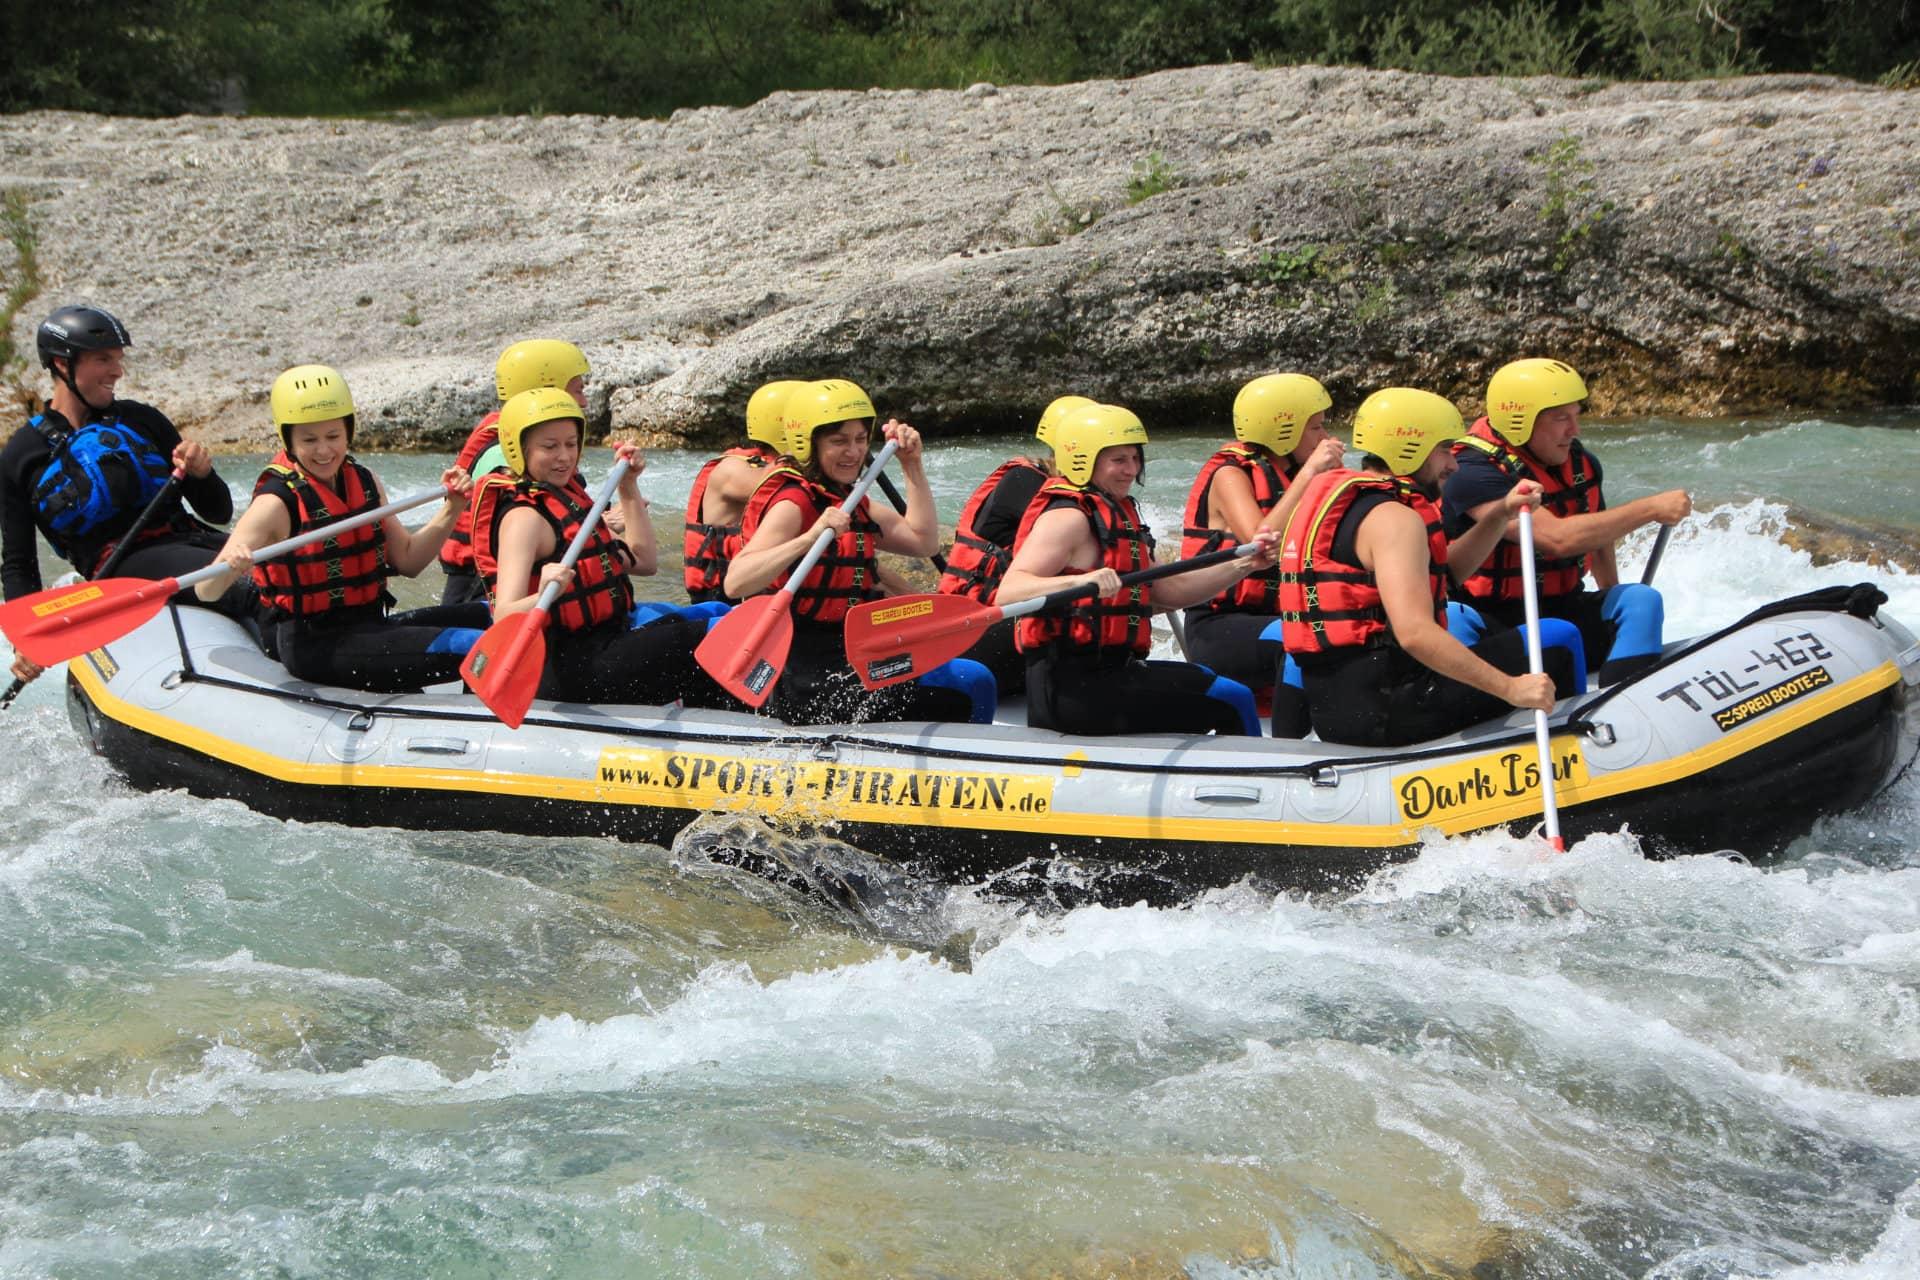 Teamevent Rafting Isar, Lenggries, Bayern